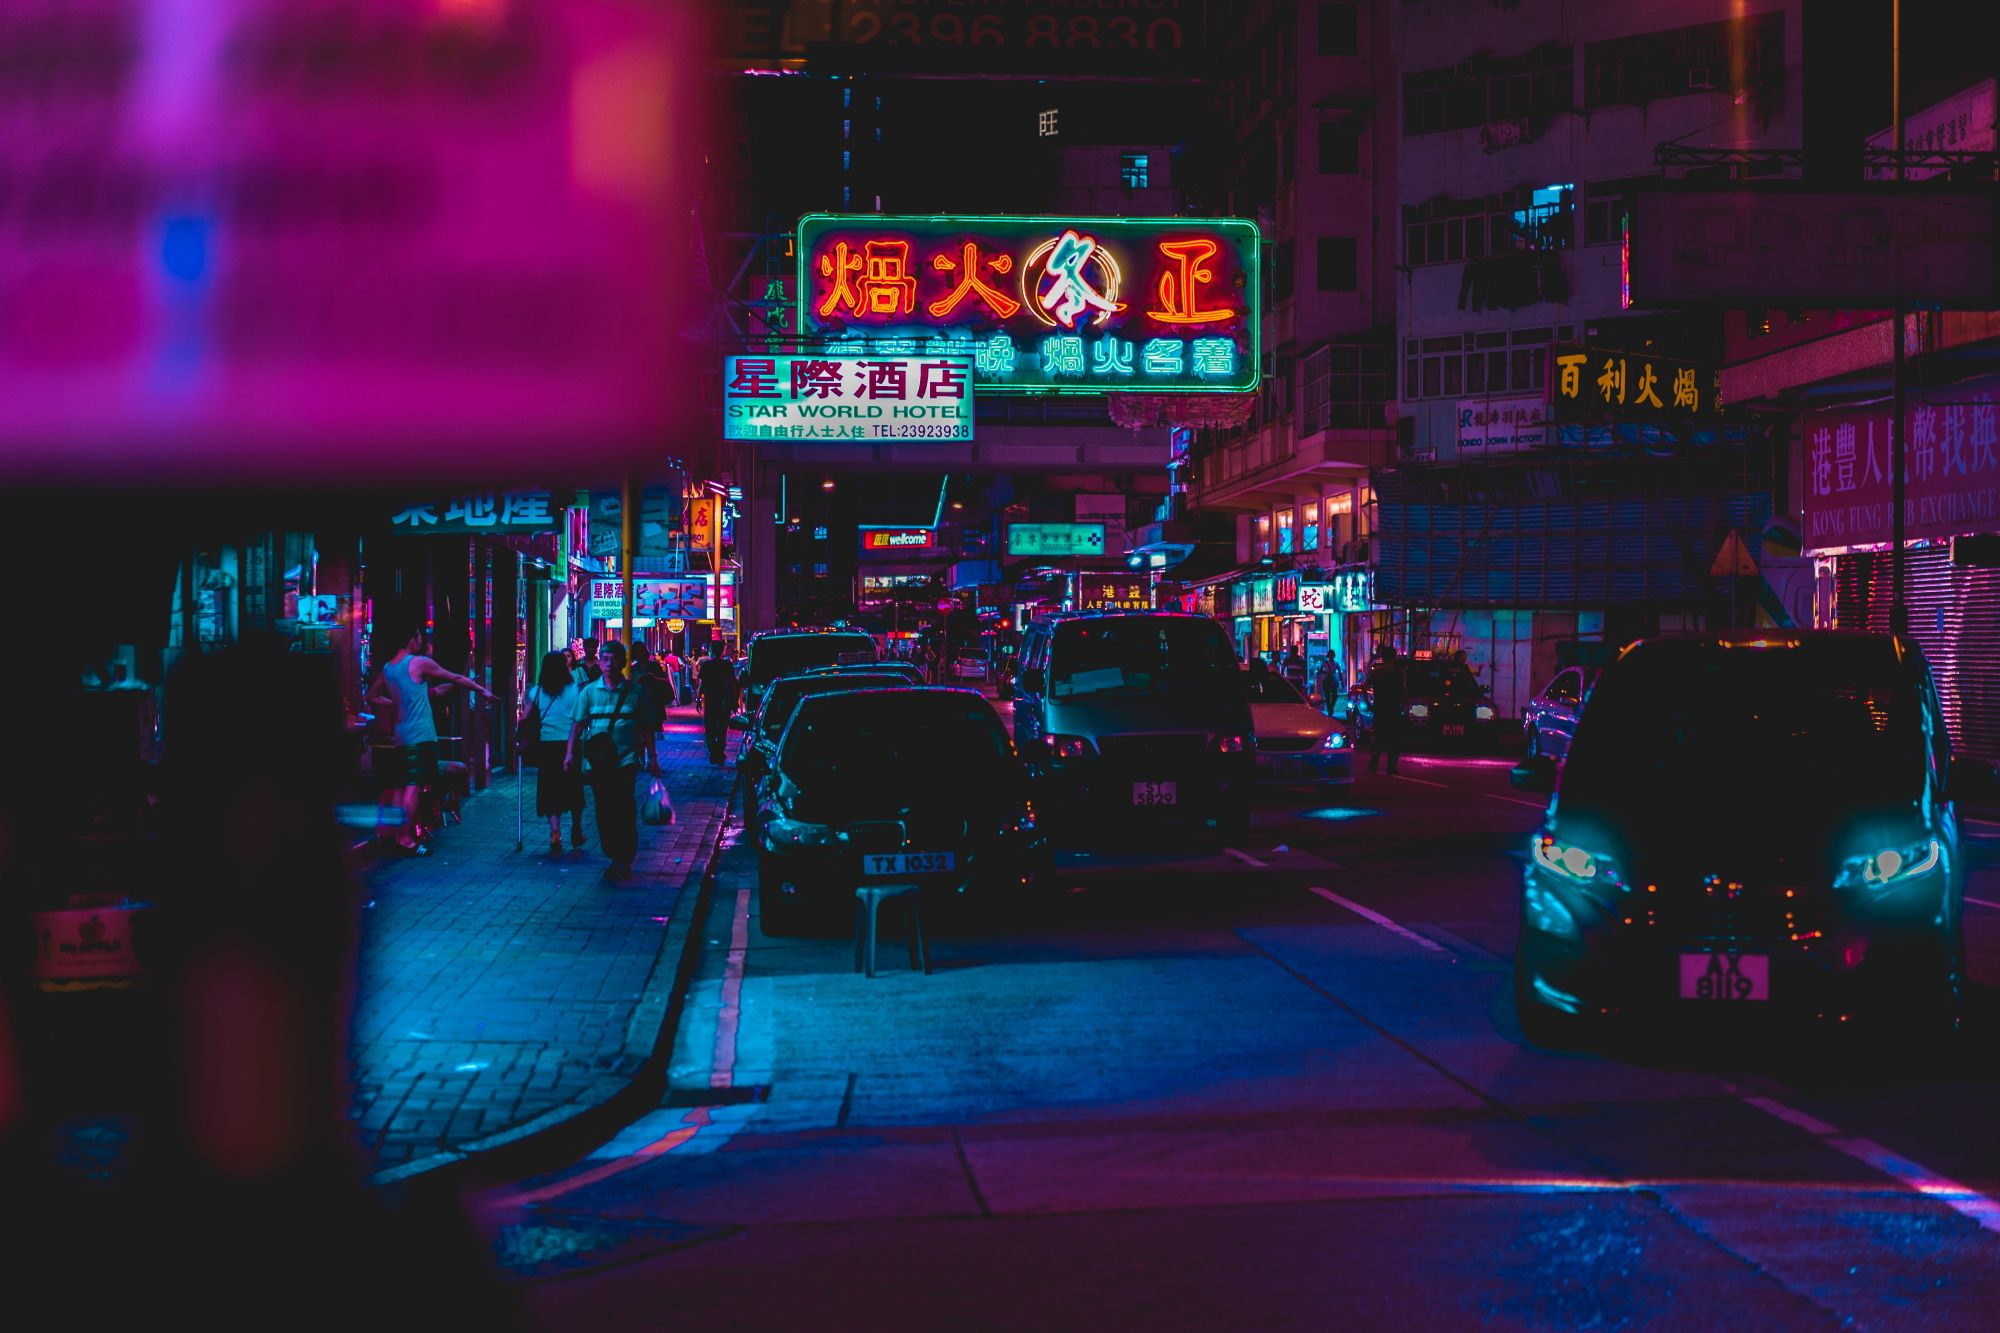 Hong Kong Book Fair 2019: 10 Bestselling Books Set In Hong Kong